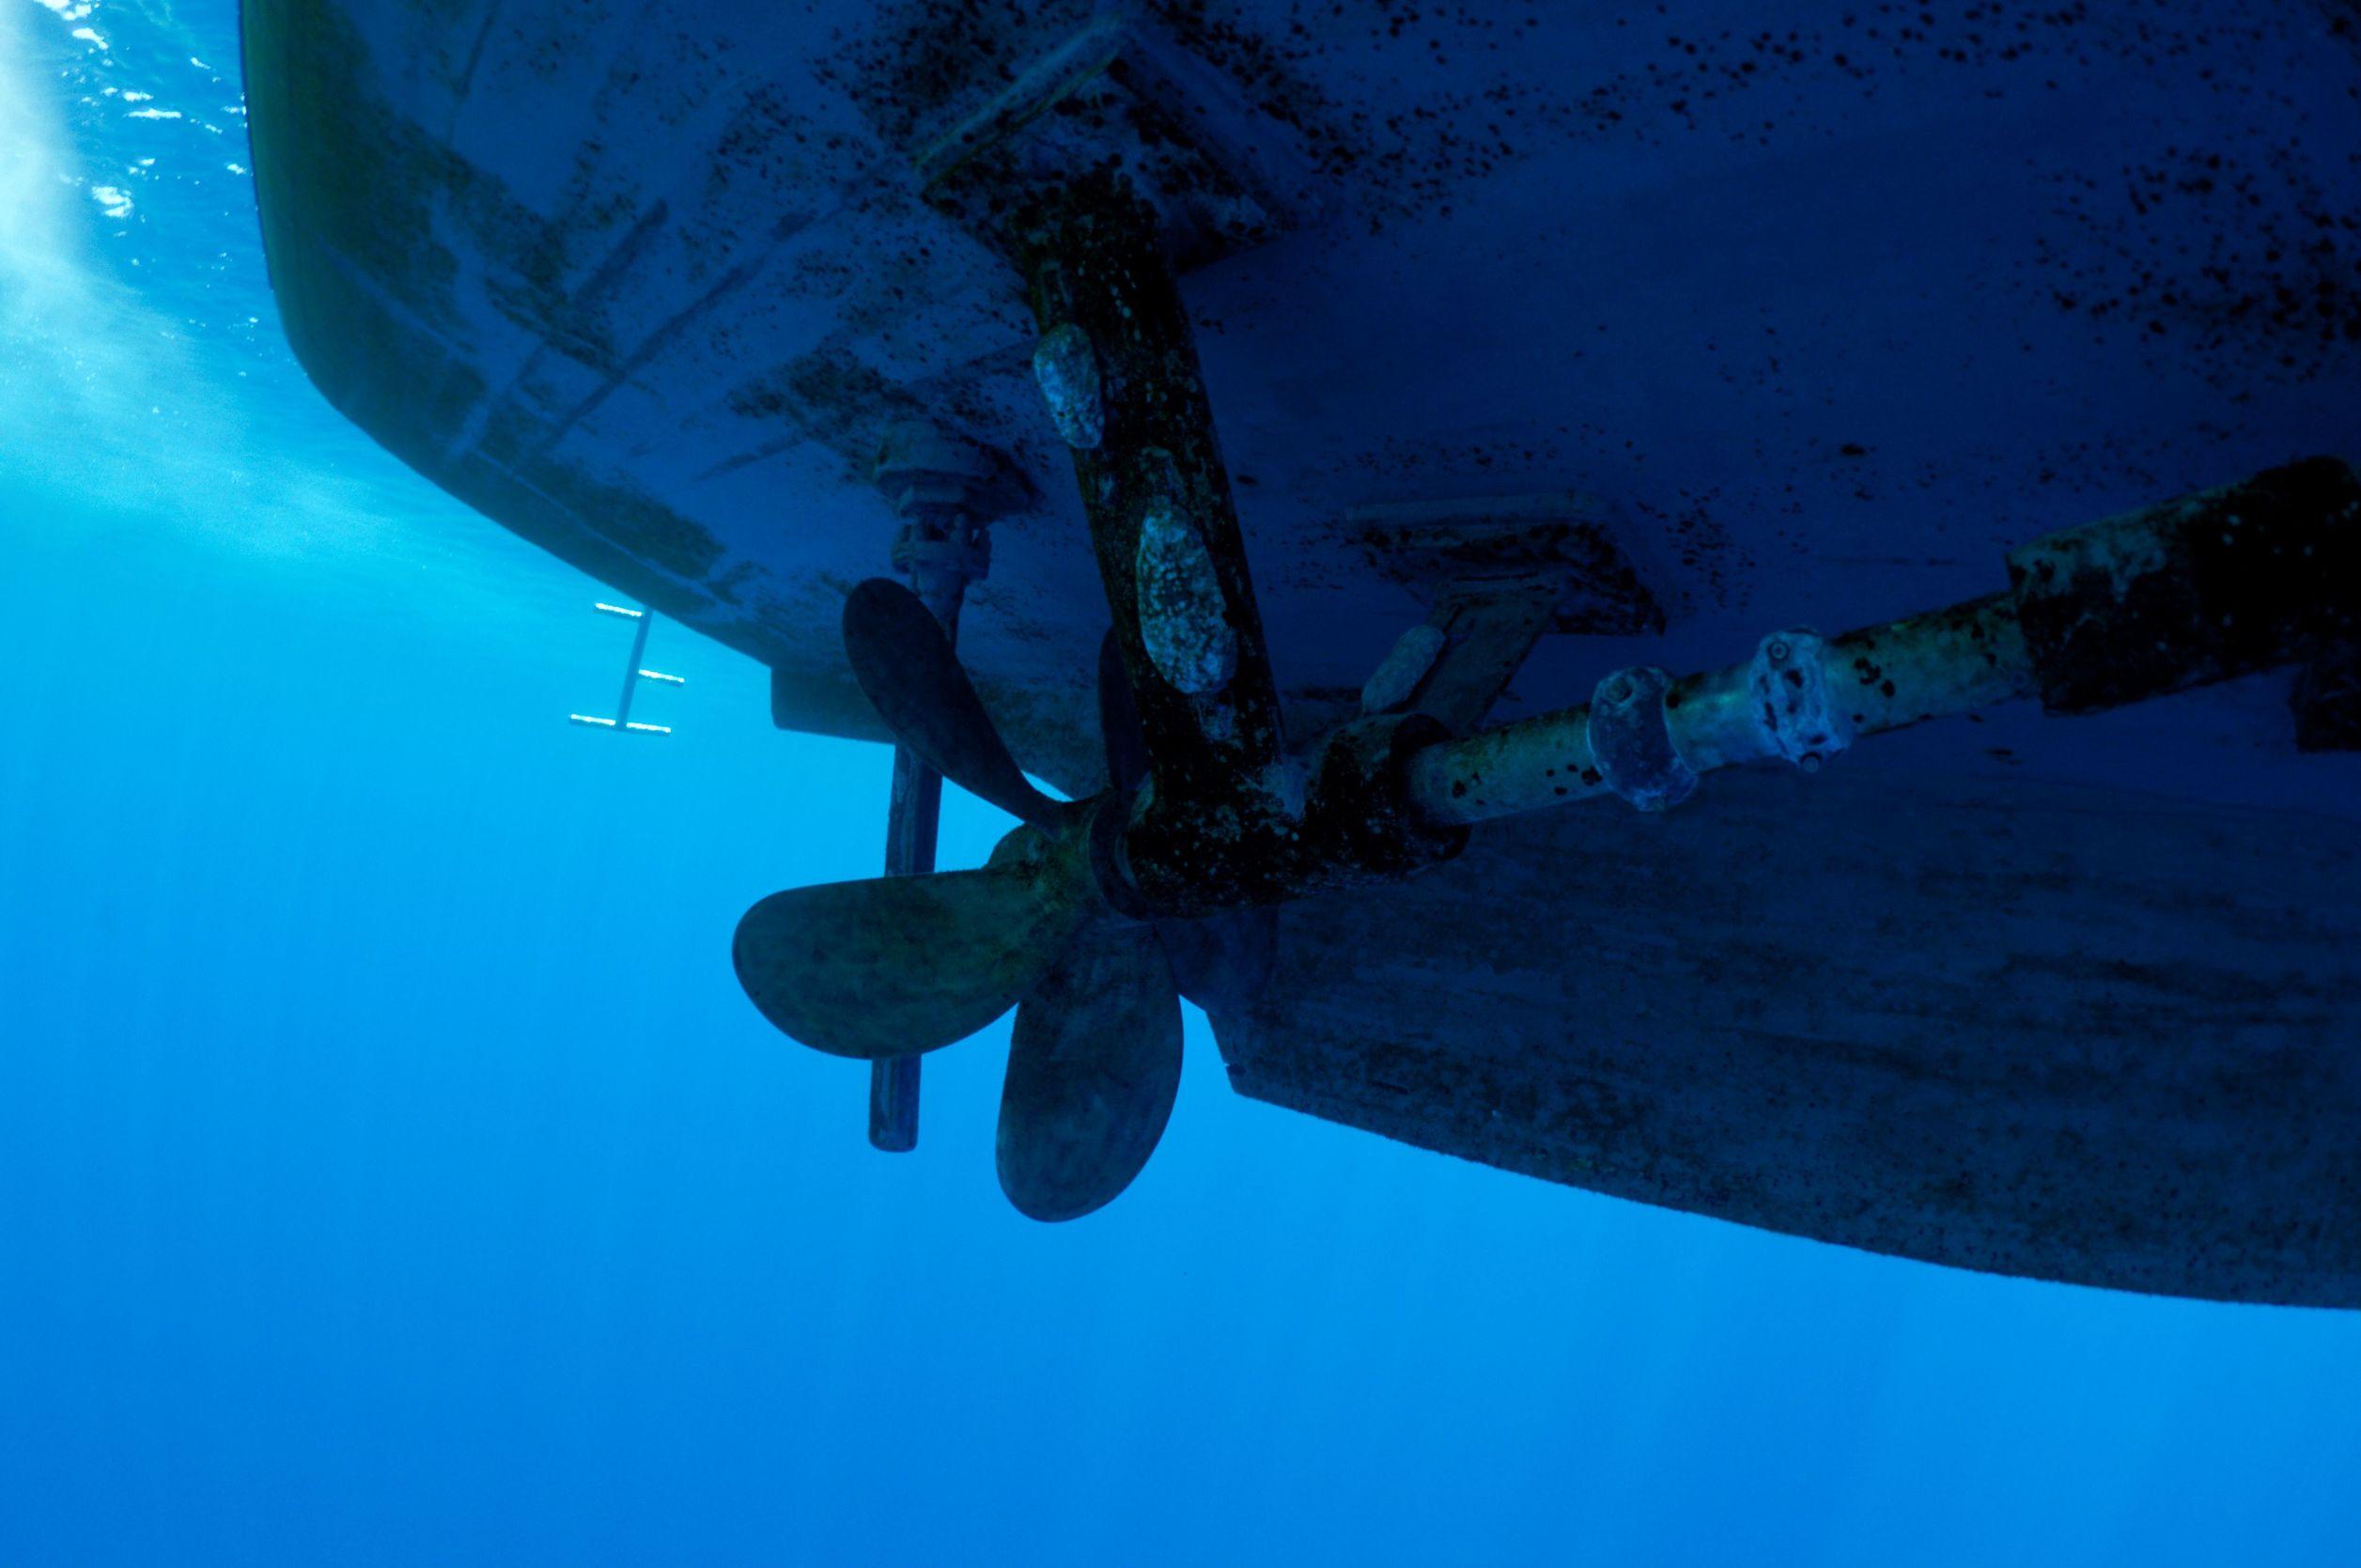 Sgt  H2o U2019s Dive Services